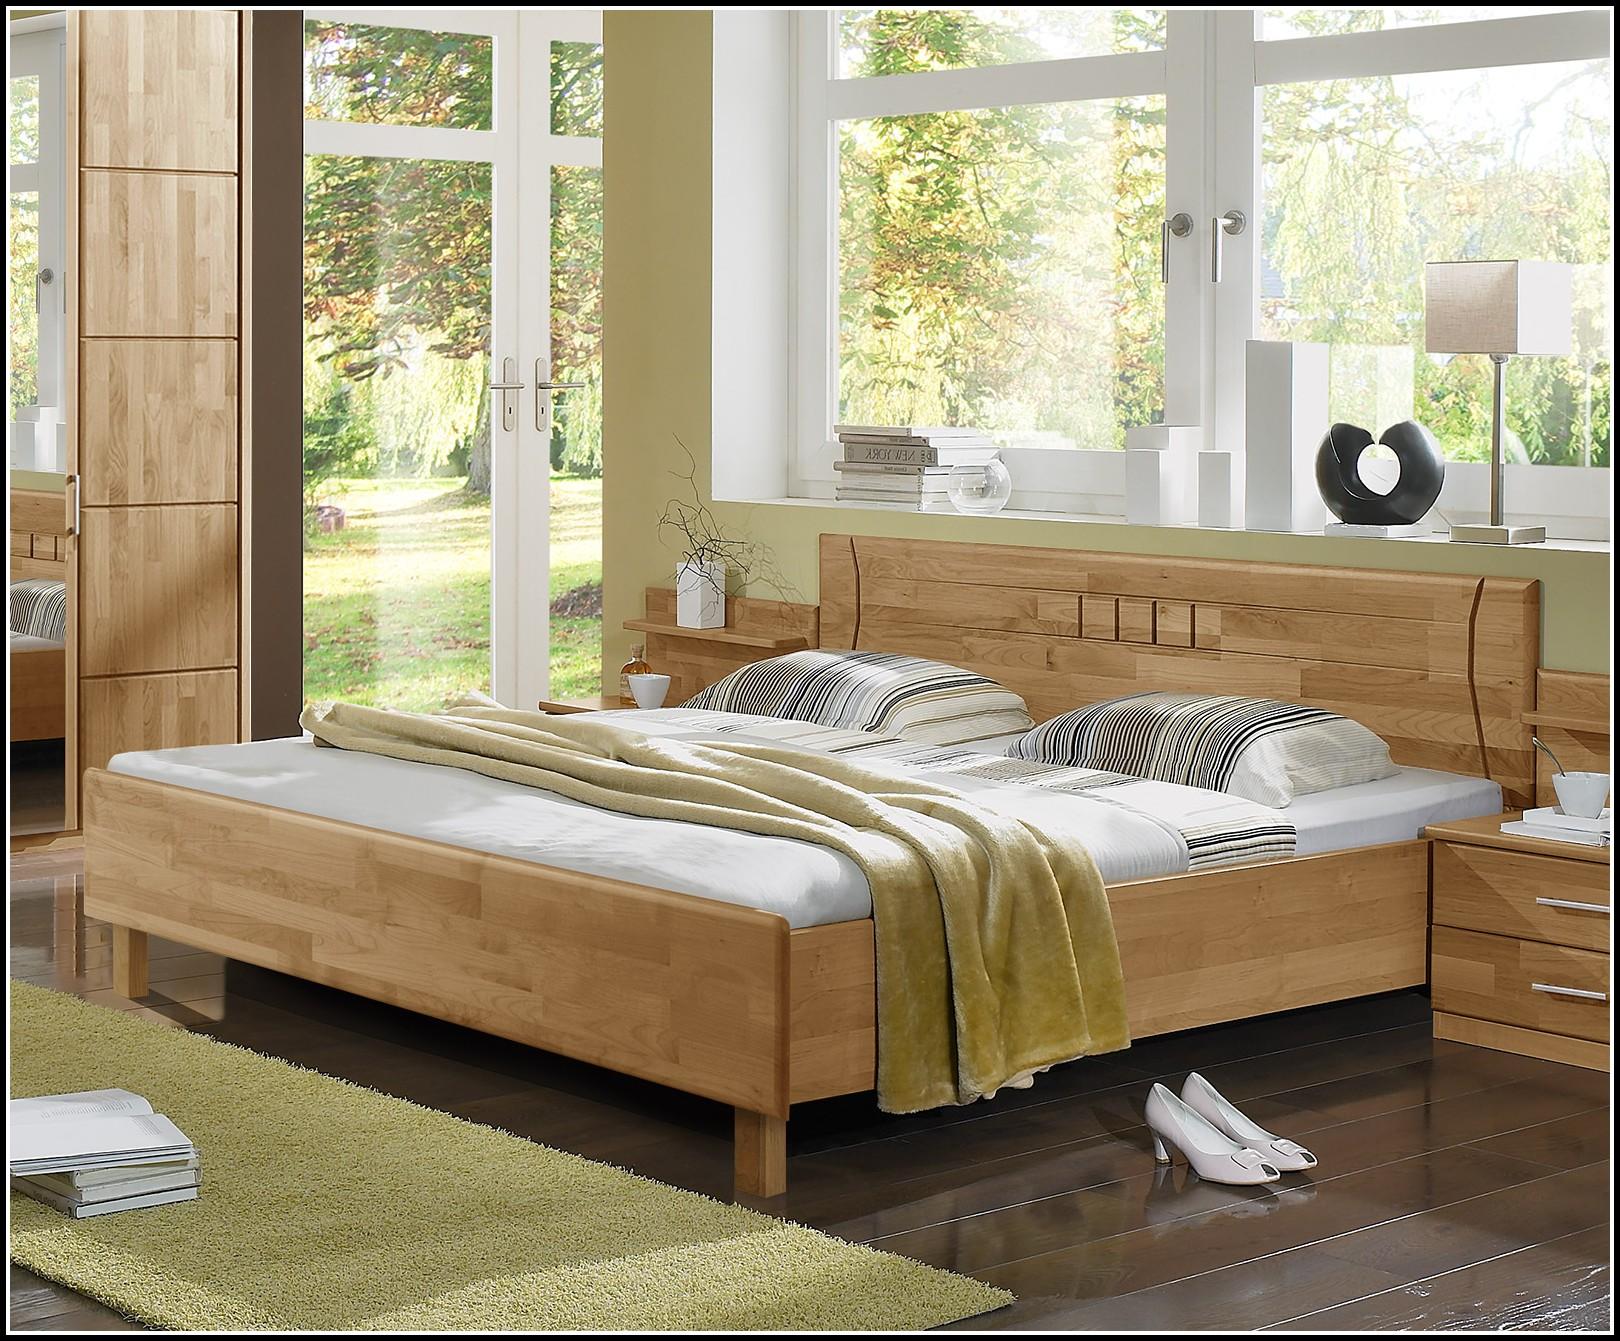 Komplett Bett 180x200 Gunstig